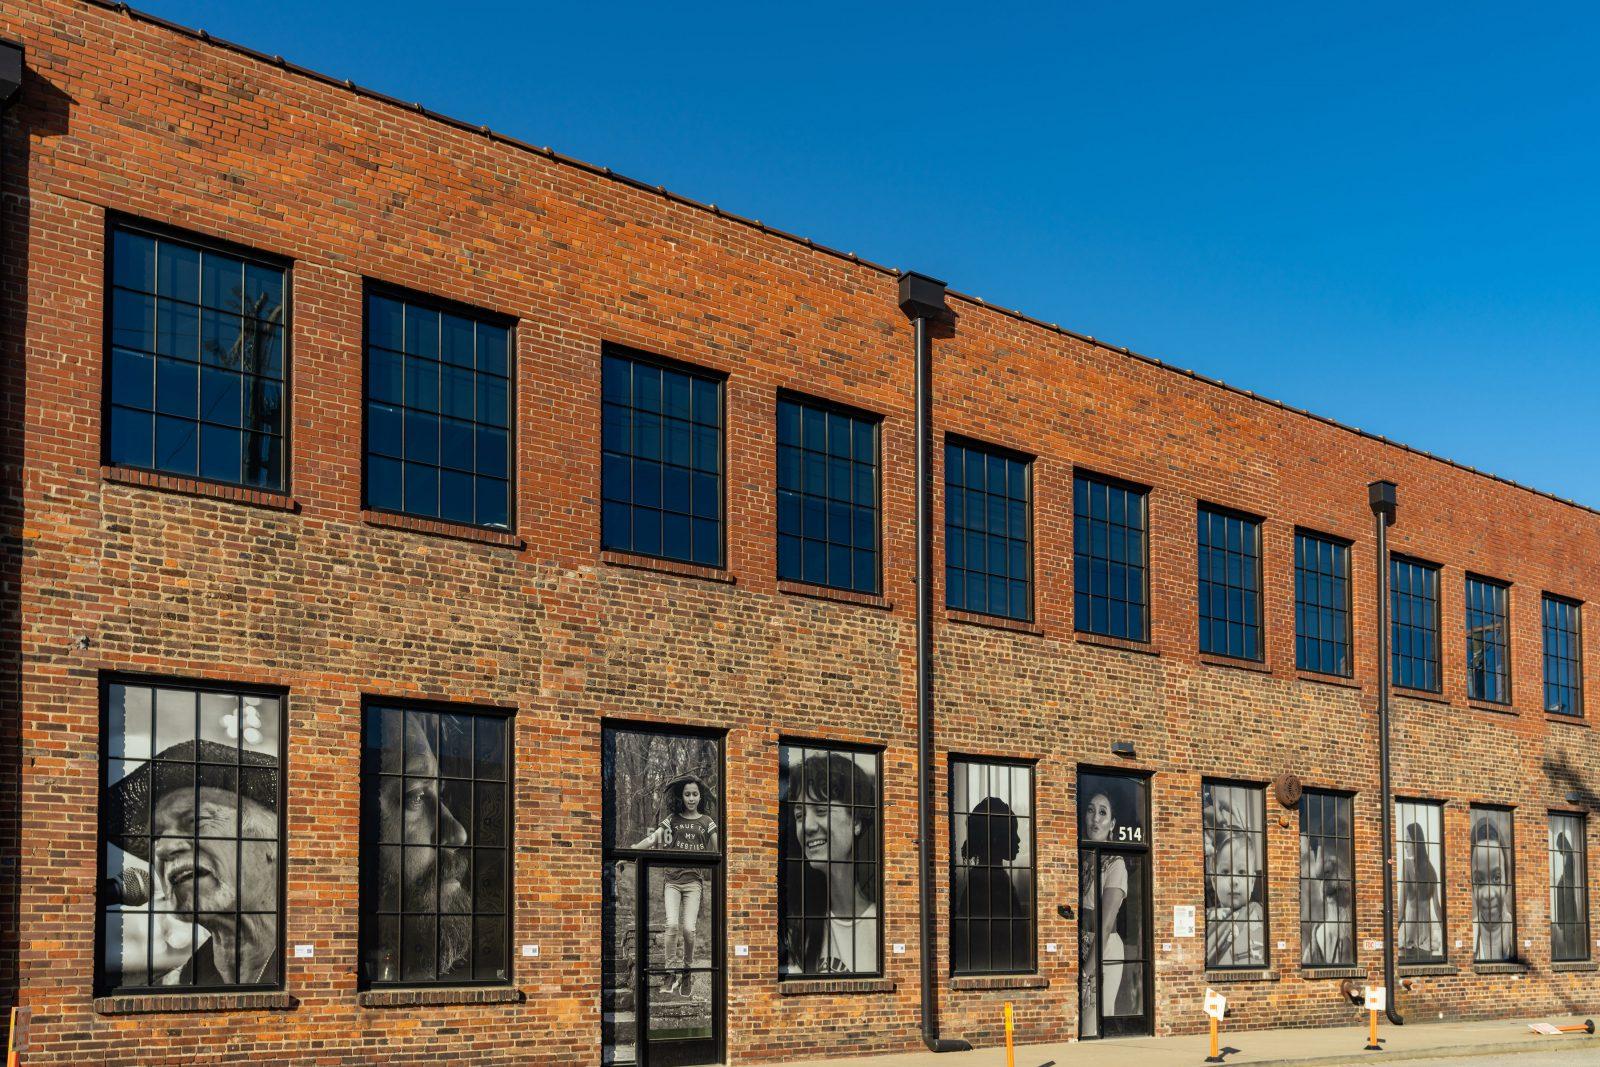 May Hosiery factory building in Nashville, TN